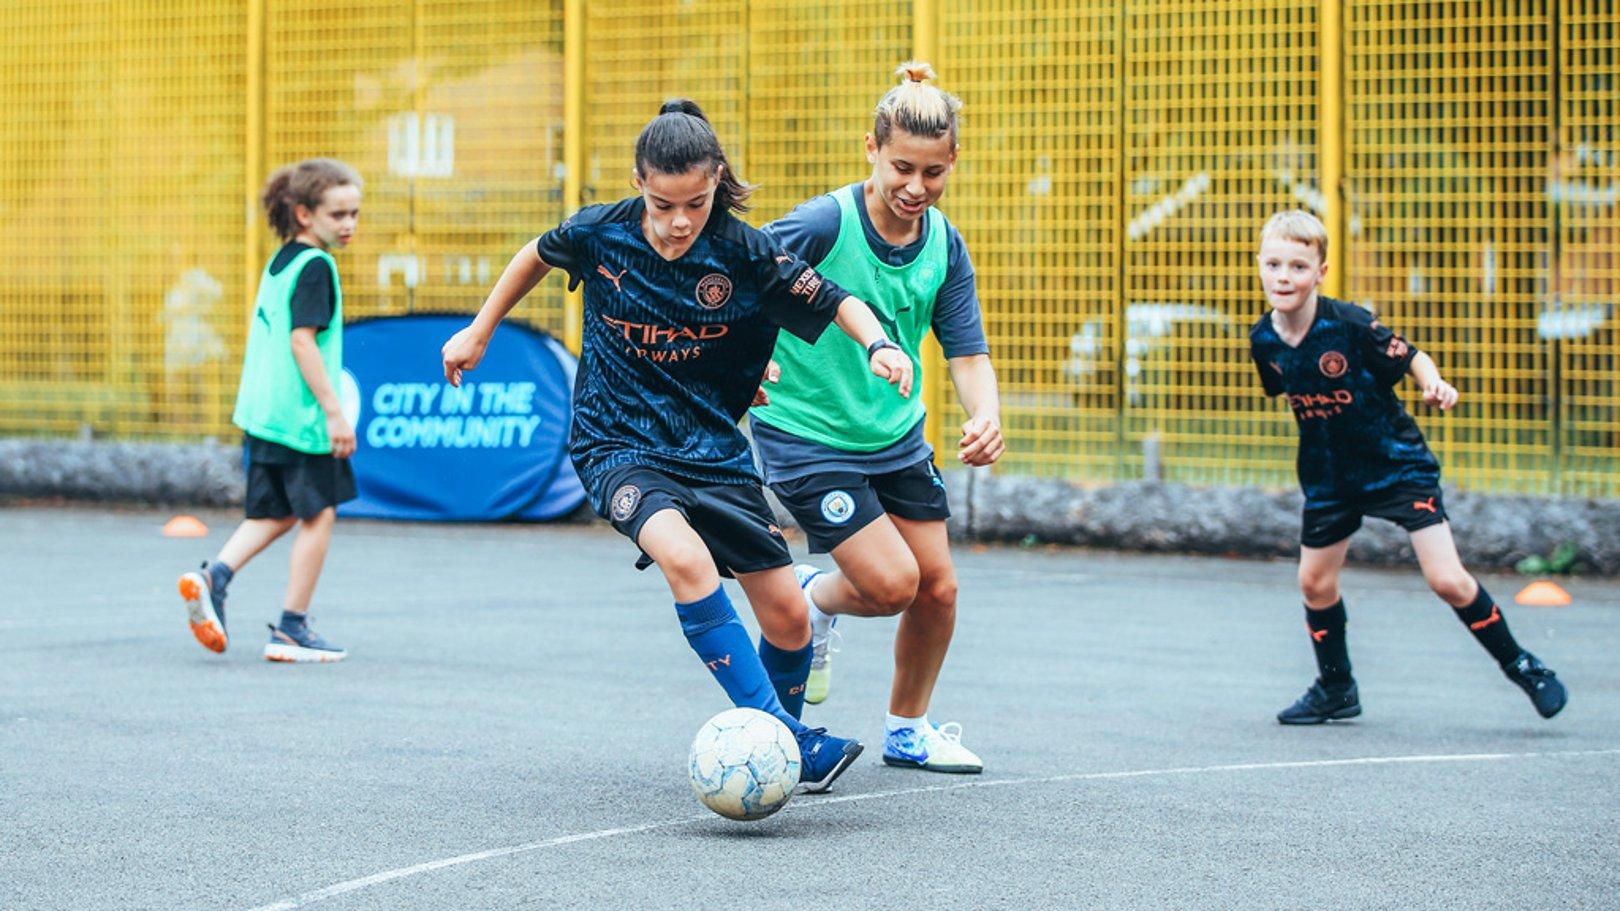 CITC providing free summer football sessions